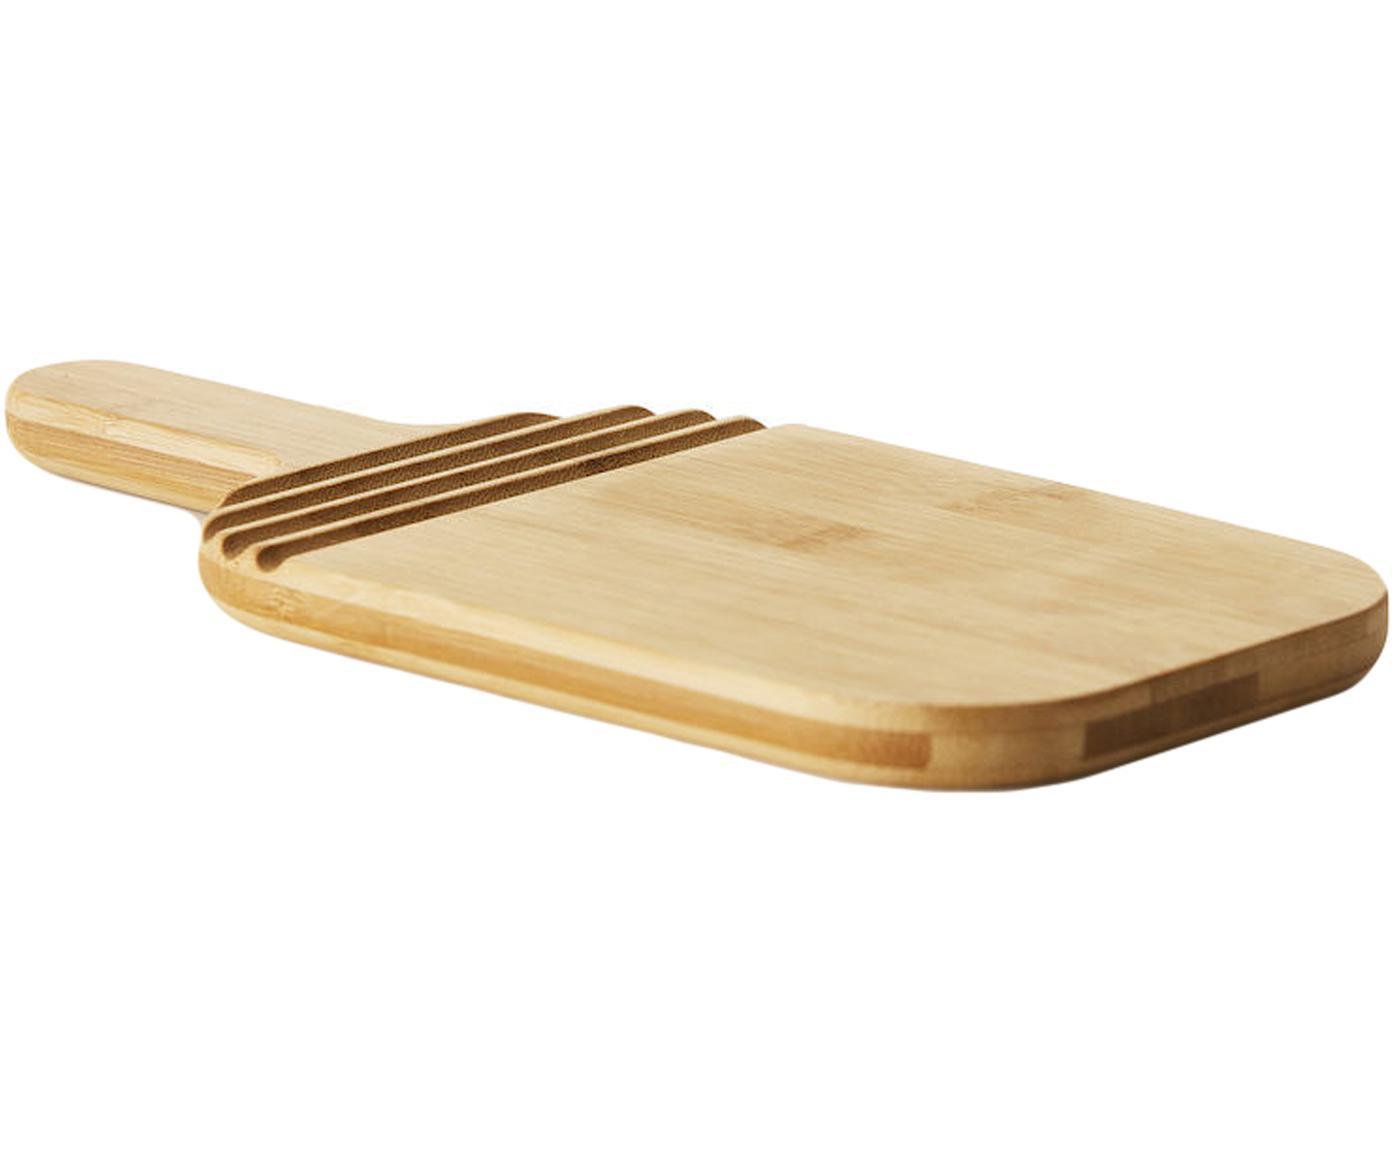 Tabla de cortar de bambú Monazi, Bambú, Bambú, An 27 x Al 2 cm